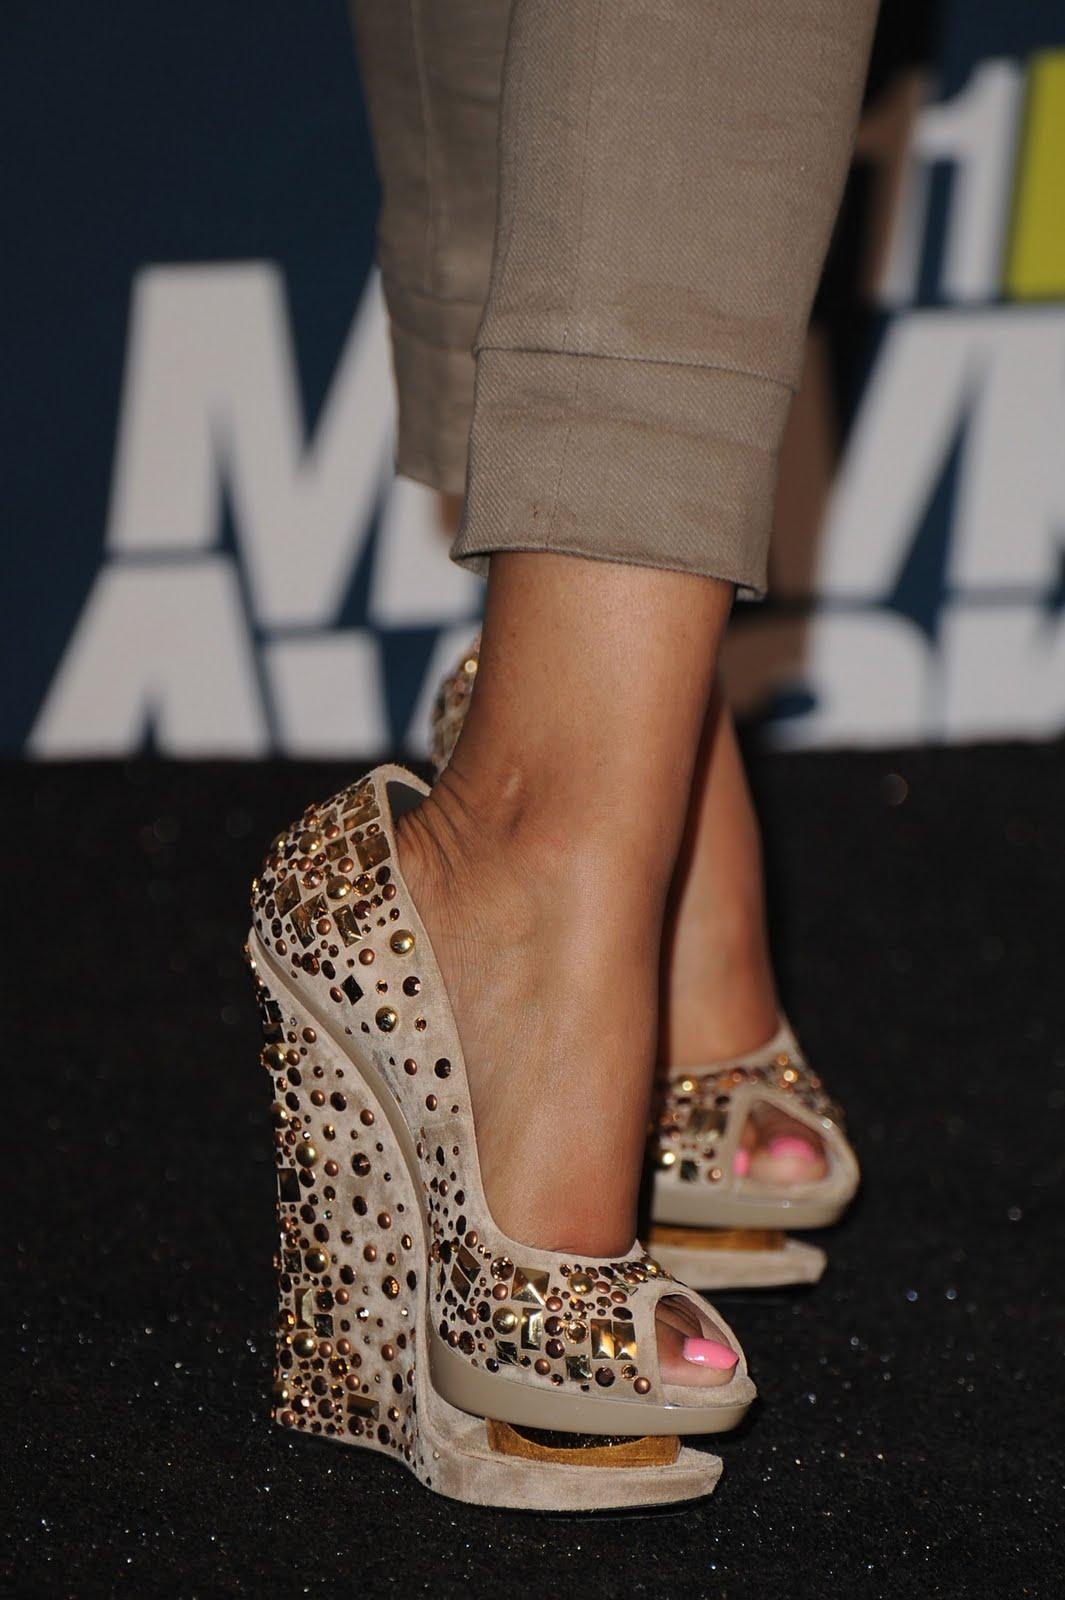 http://2.bp.blogspot.com/-xMuI8psm3VQ/TfYXV3M9iDI/AAAAAAAAAxg/C9j95HUyoBQ/s1600/Nicki-Minaj-Feet-425298.jpg